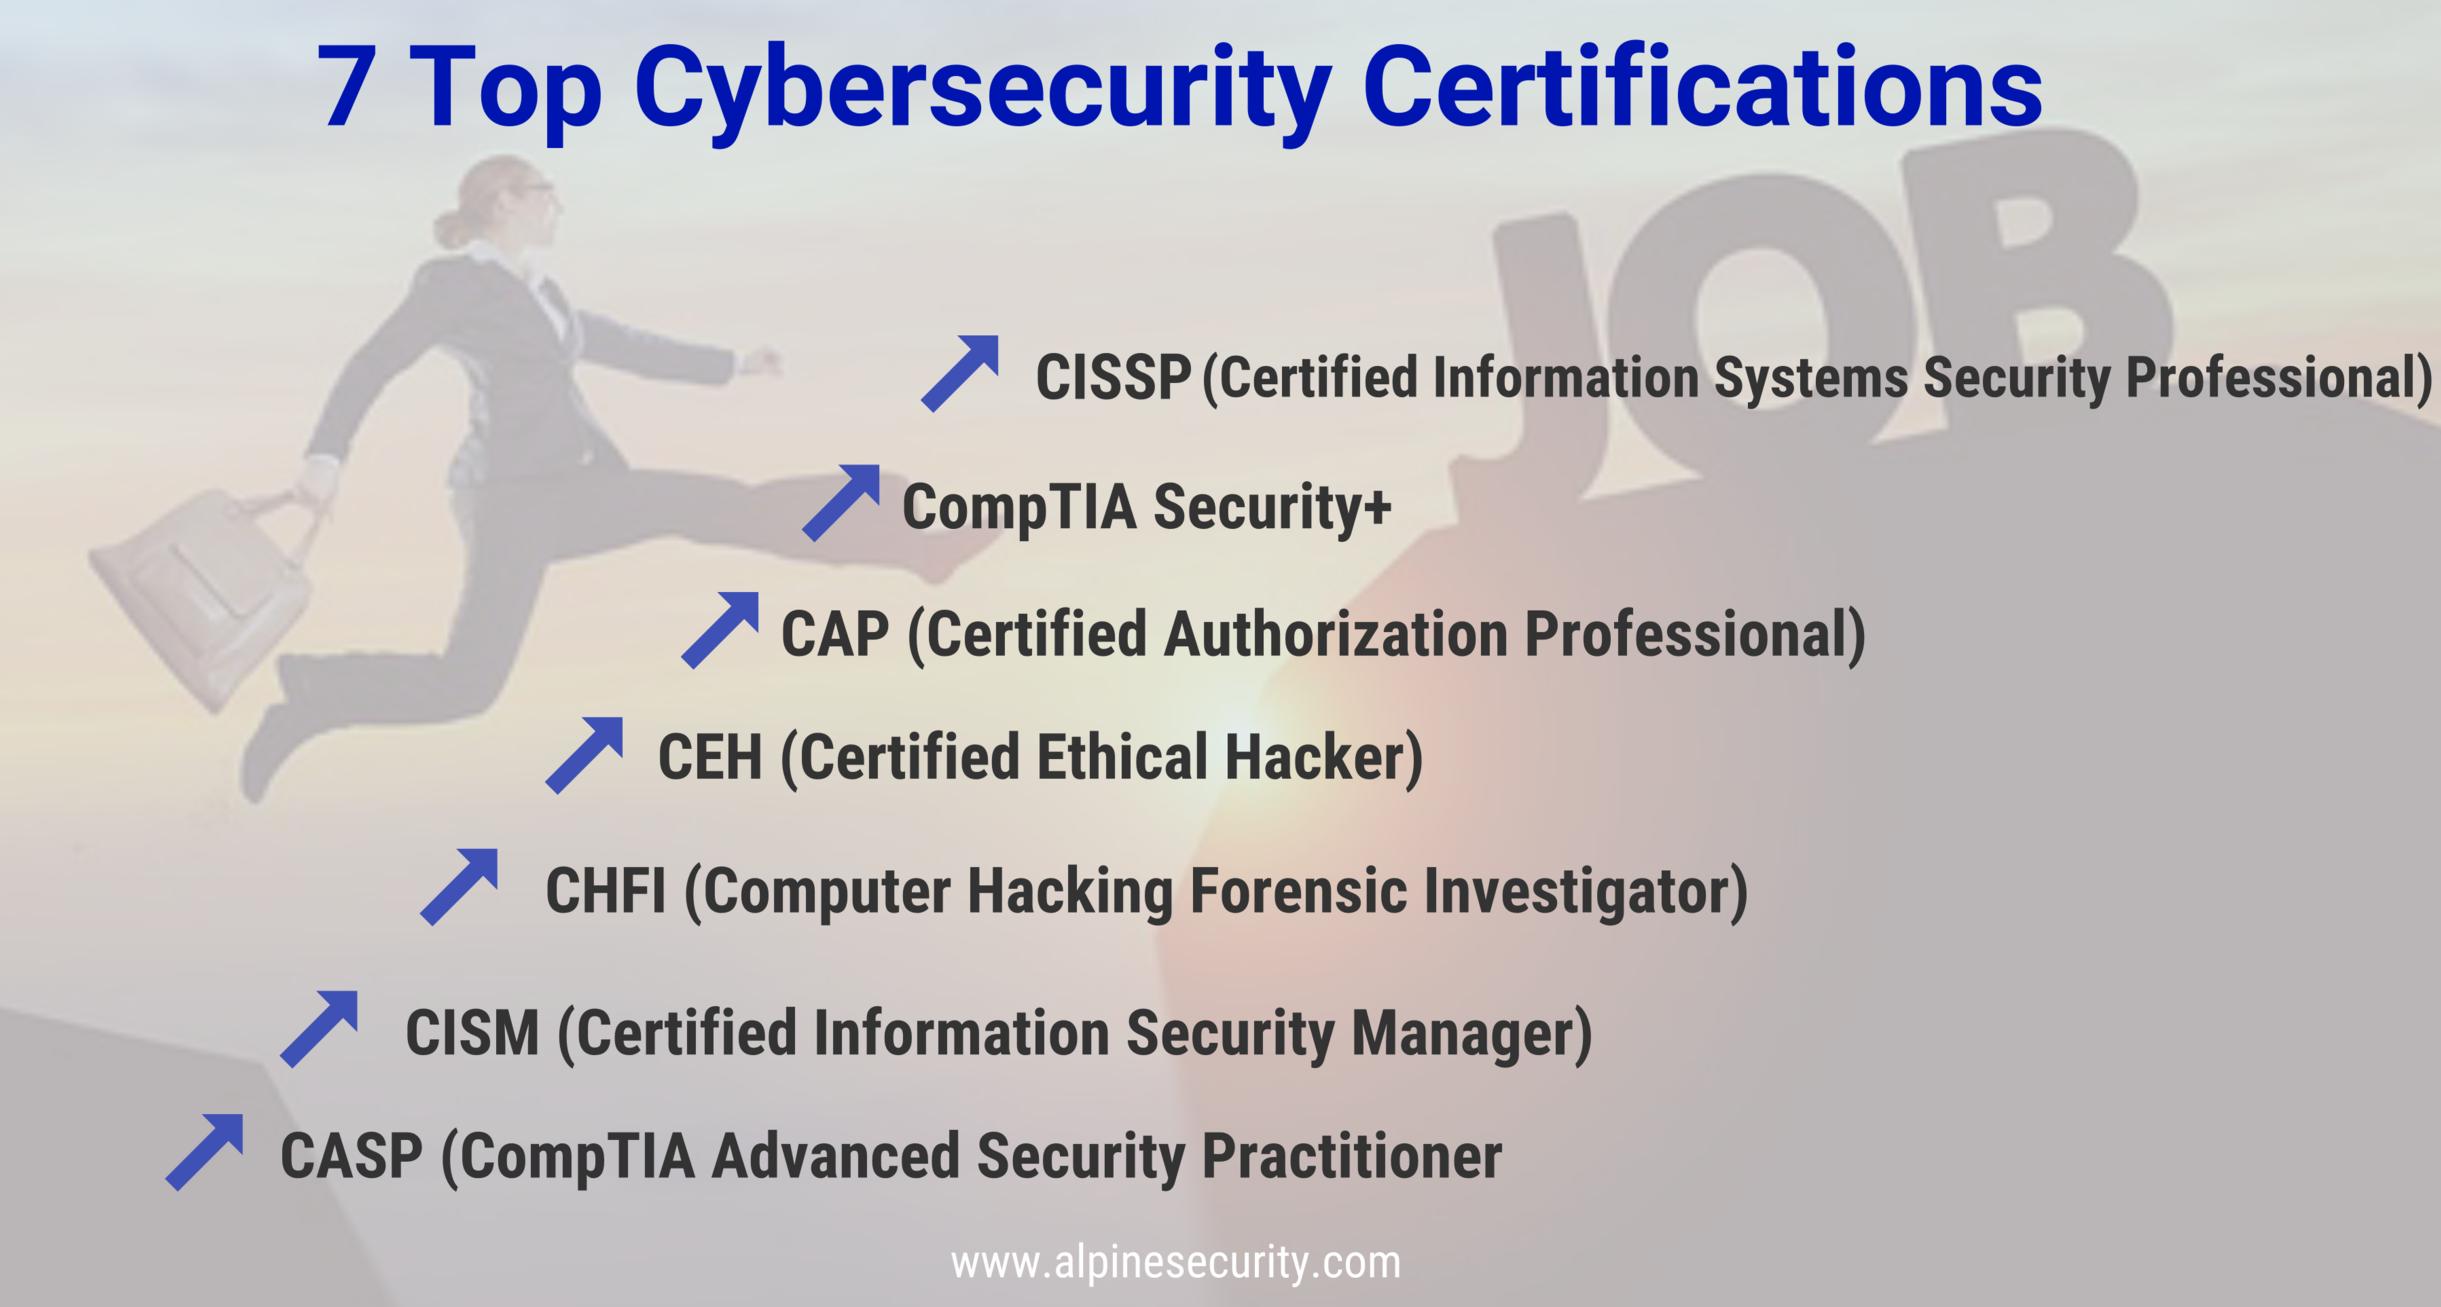 Top Cybersecurity Certifications